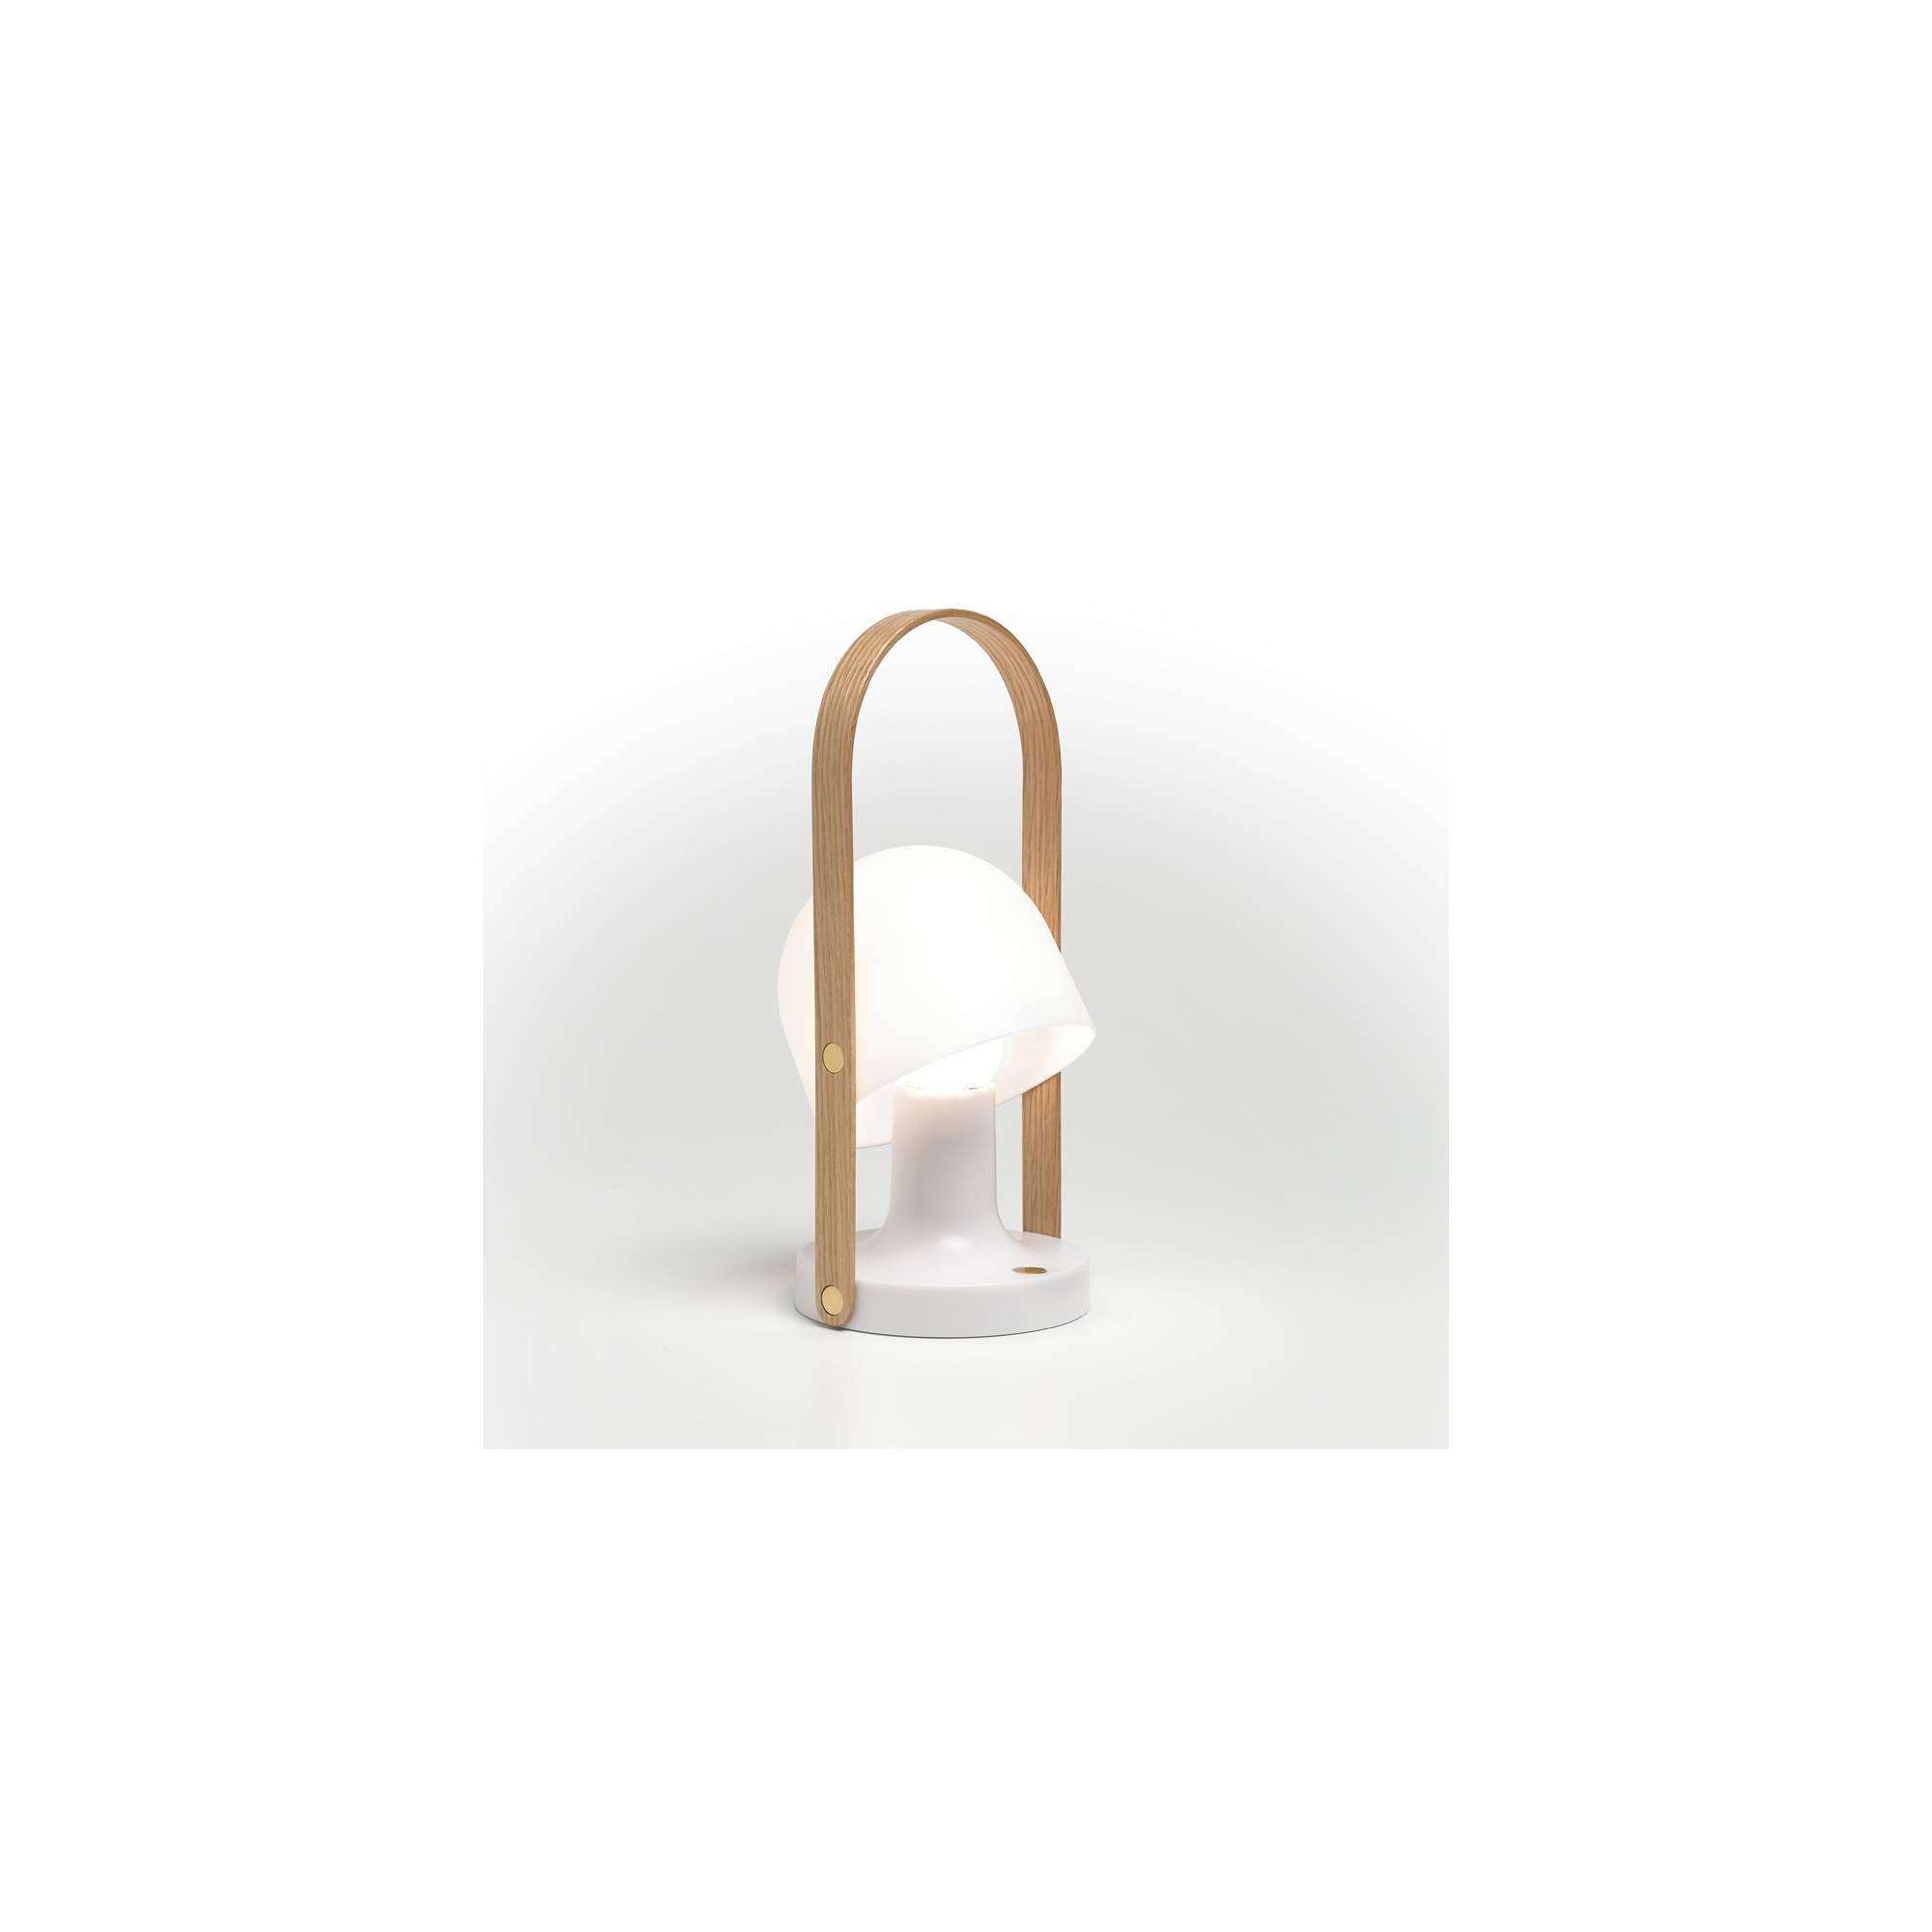 lampe portable follow me. Black Bedroom Furniture Sets. Home Design Ideas